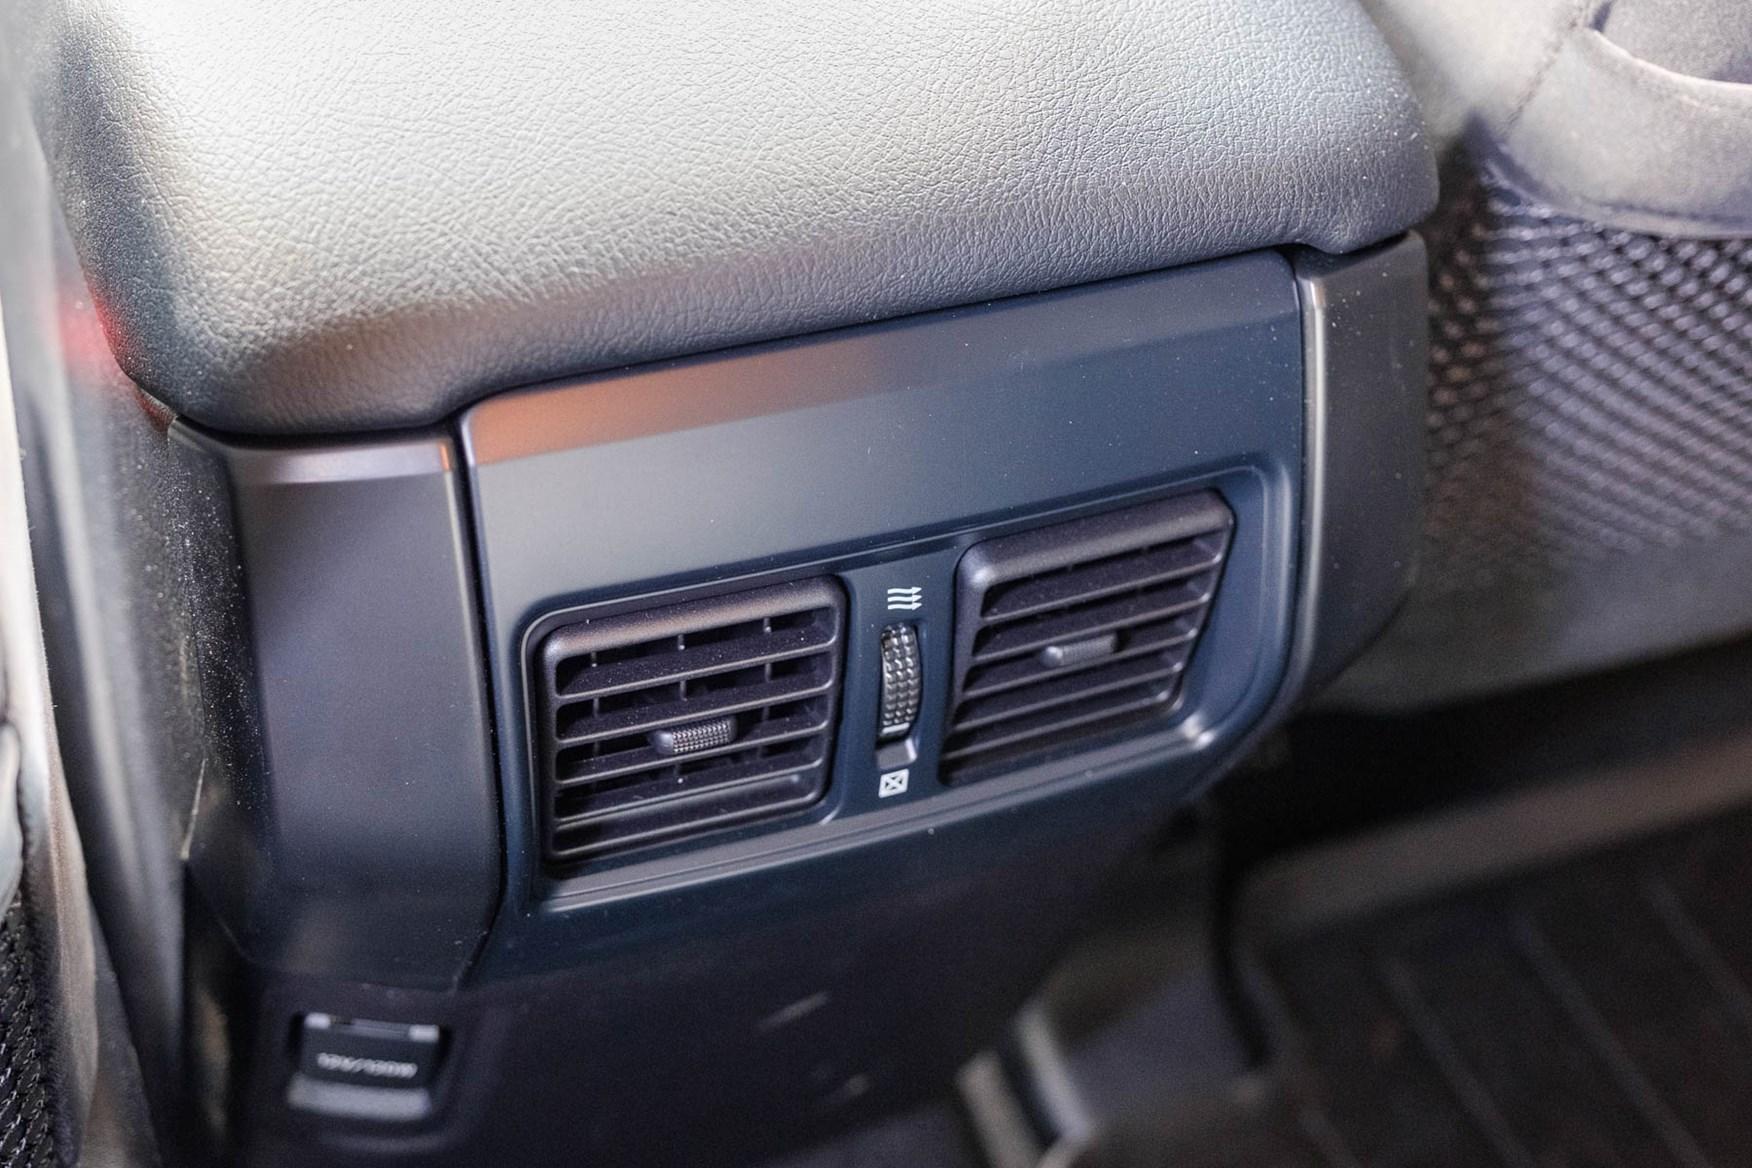 Toyota Land Cruiser Utility rear heating vents